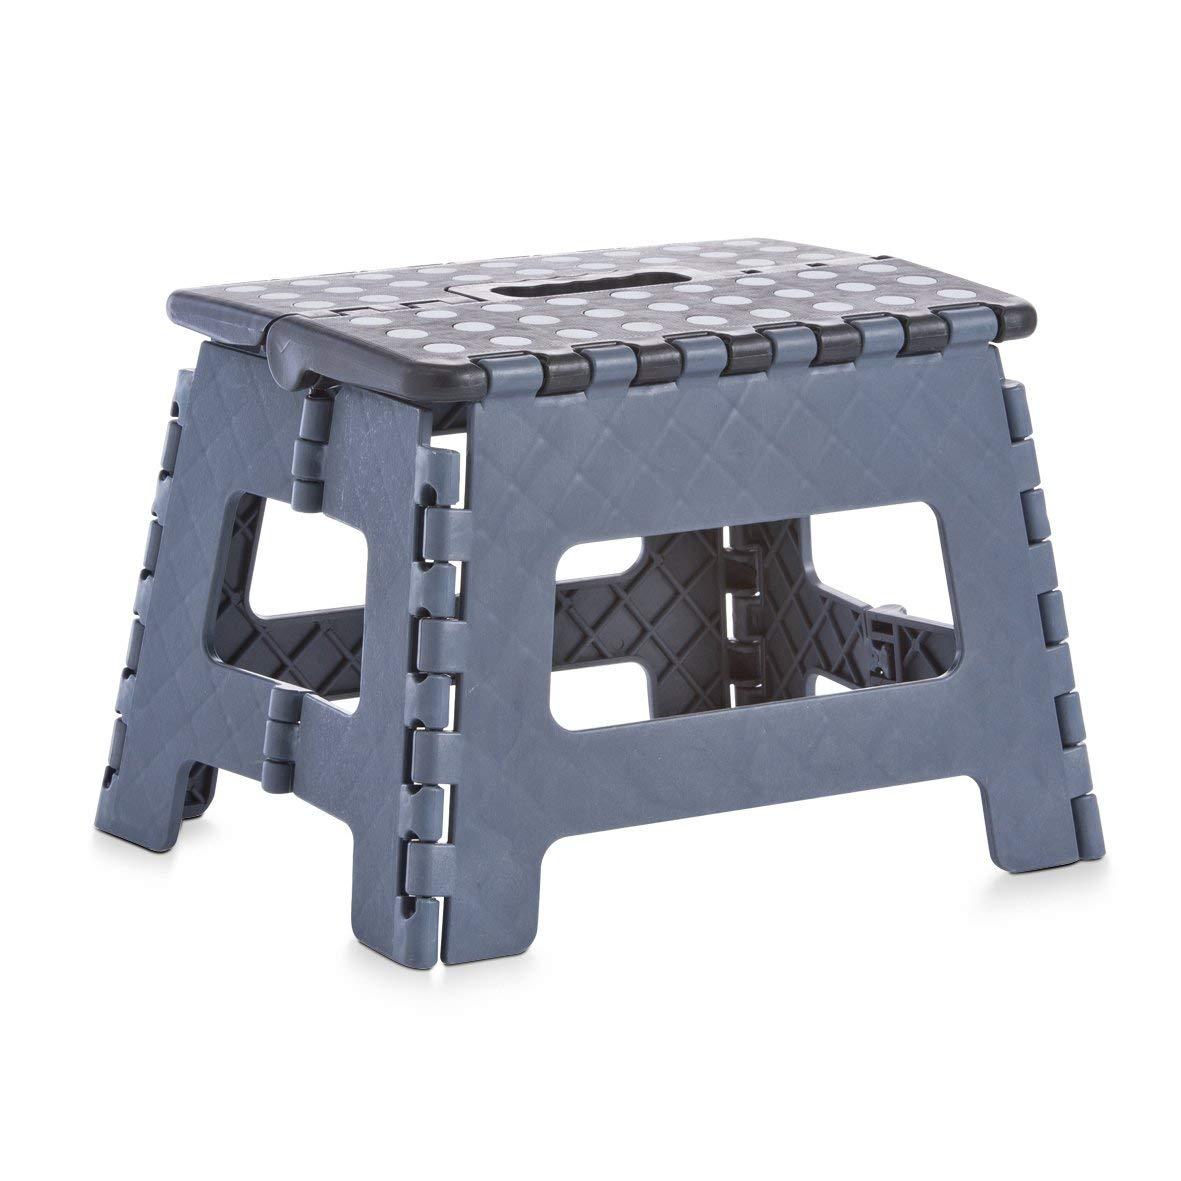 Zeller Klapphocker, Kunststoff, Maße: 32x25x22 cm, Grau